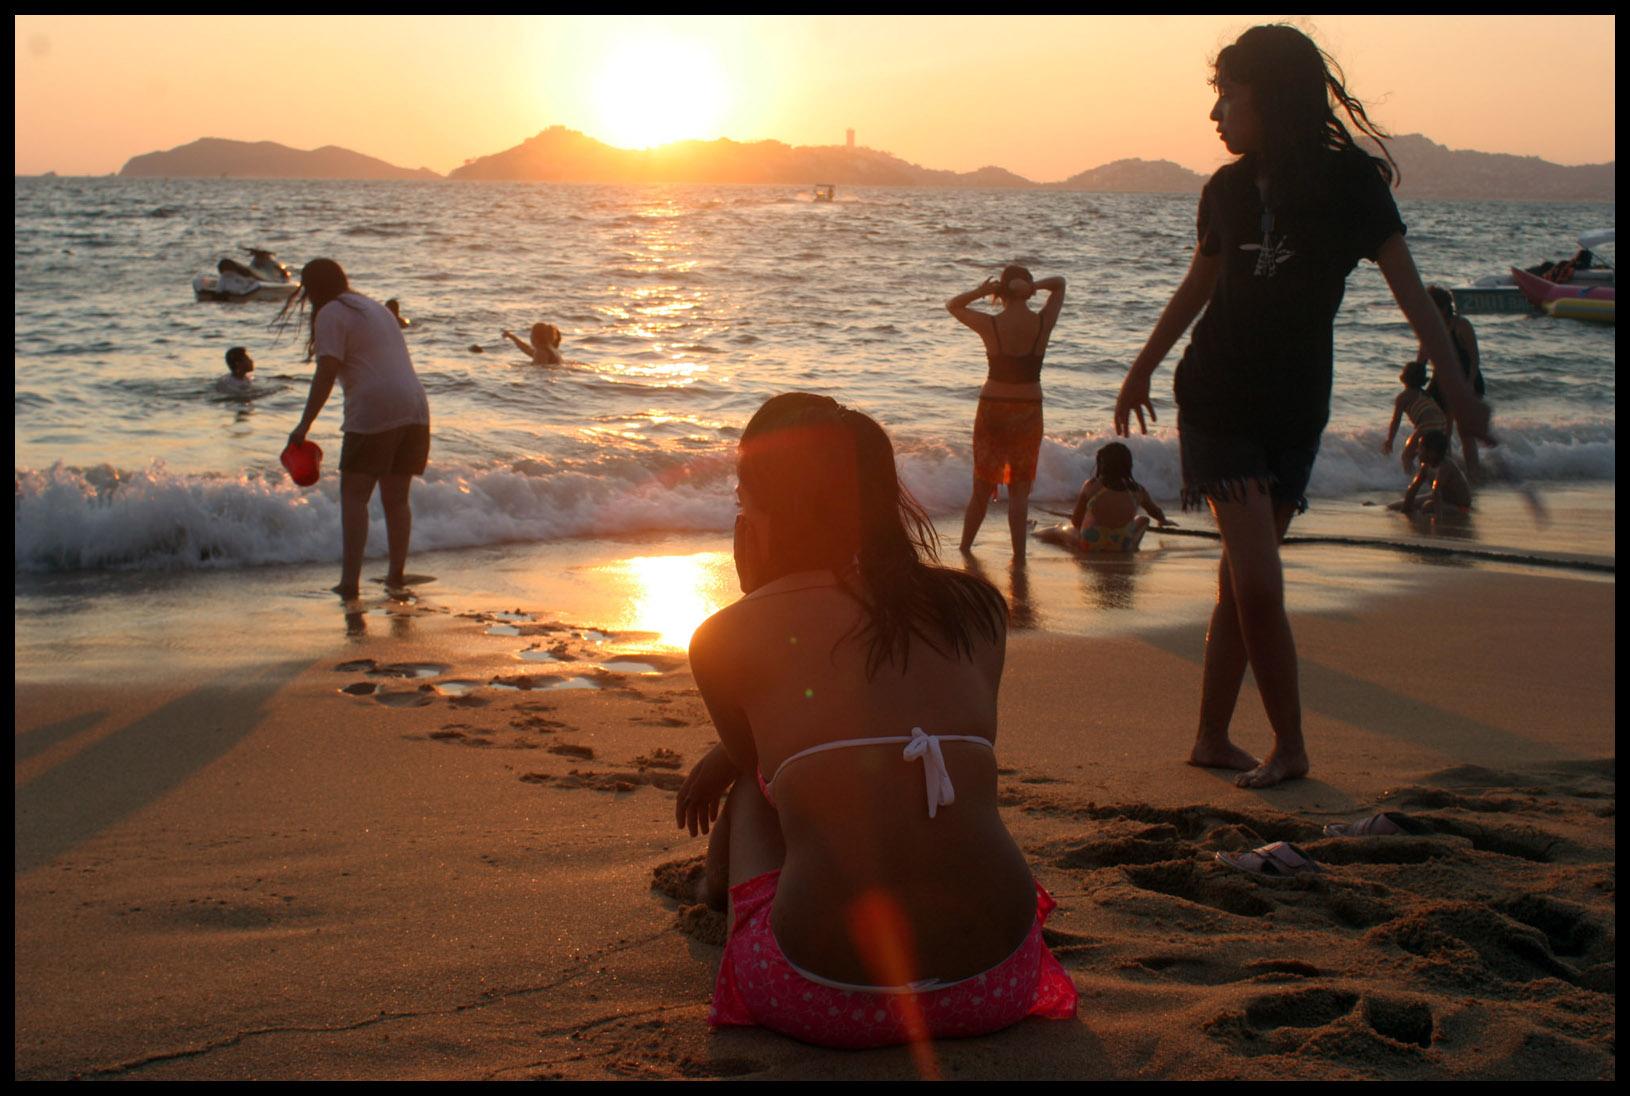 Acapulco03.jpg